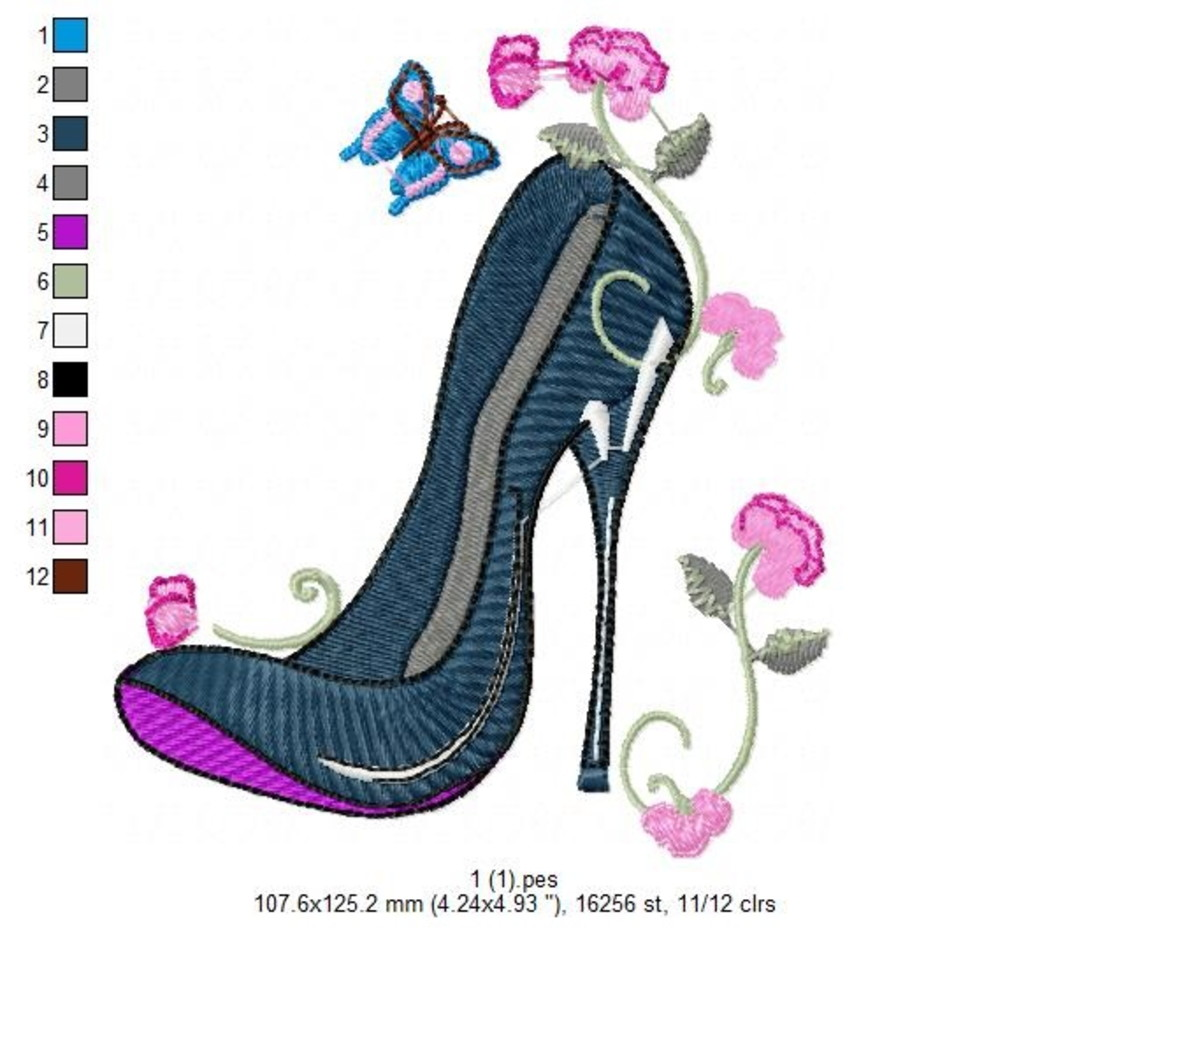 adf9636d Sapato Salto Alto 12 Matrizes Formato PES JEF DST XXX EXP no Elo7 ...